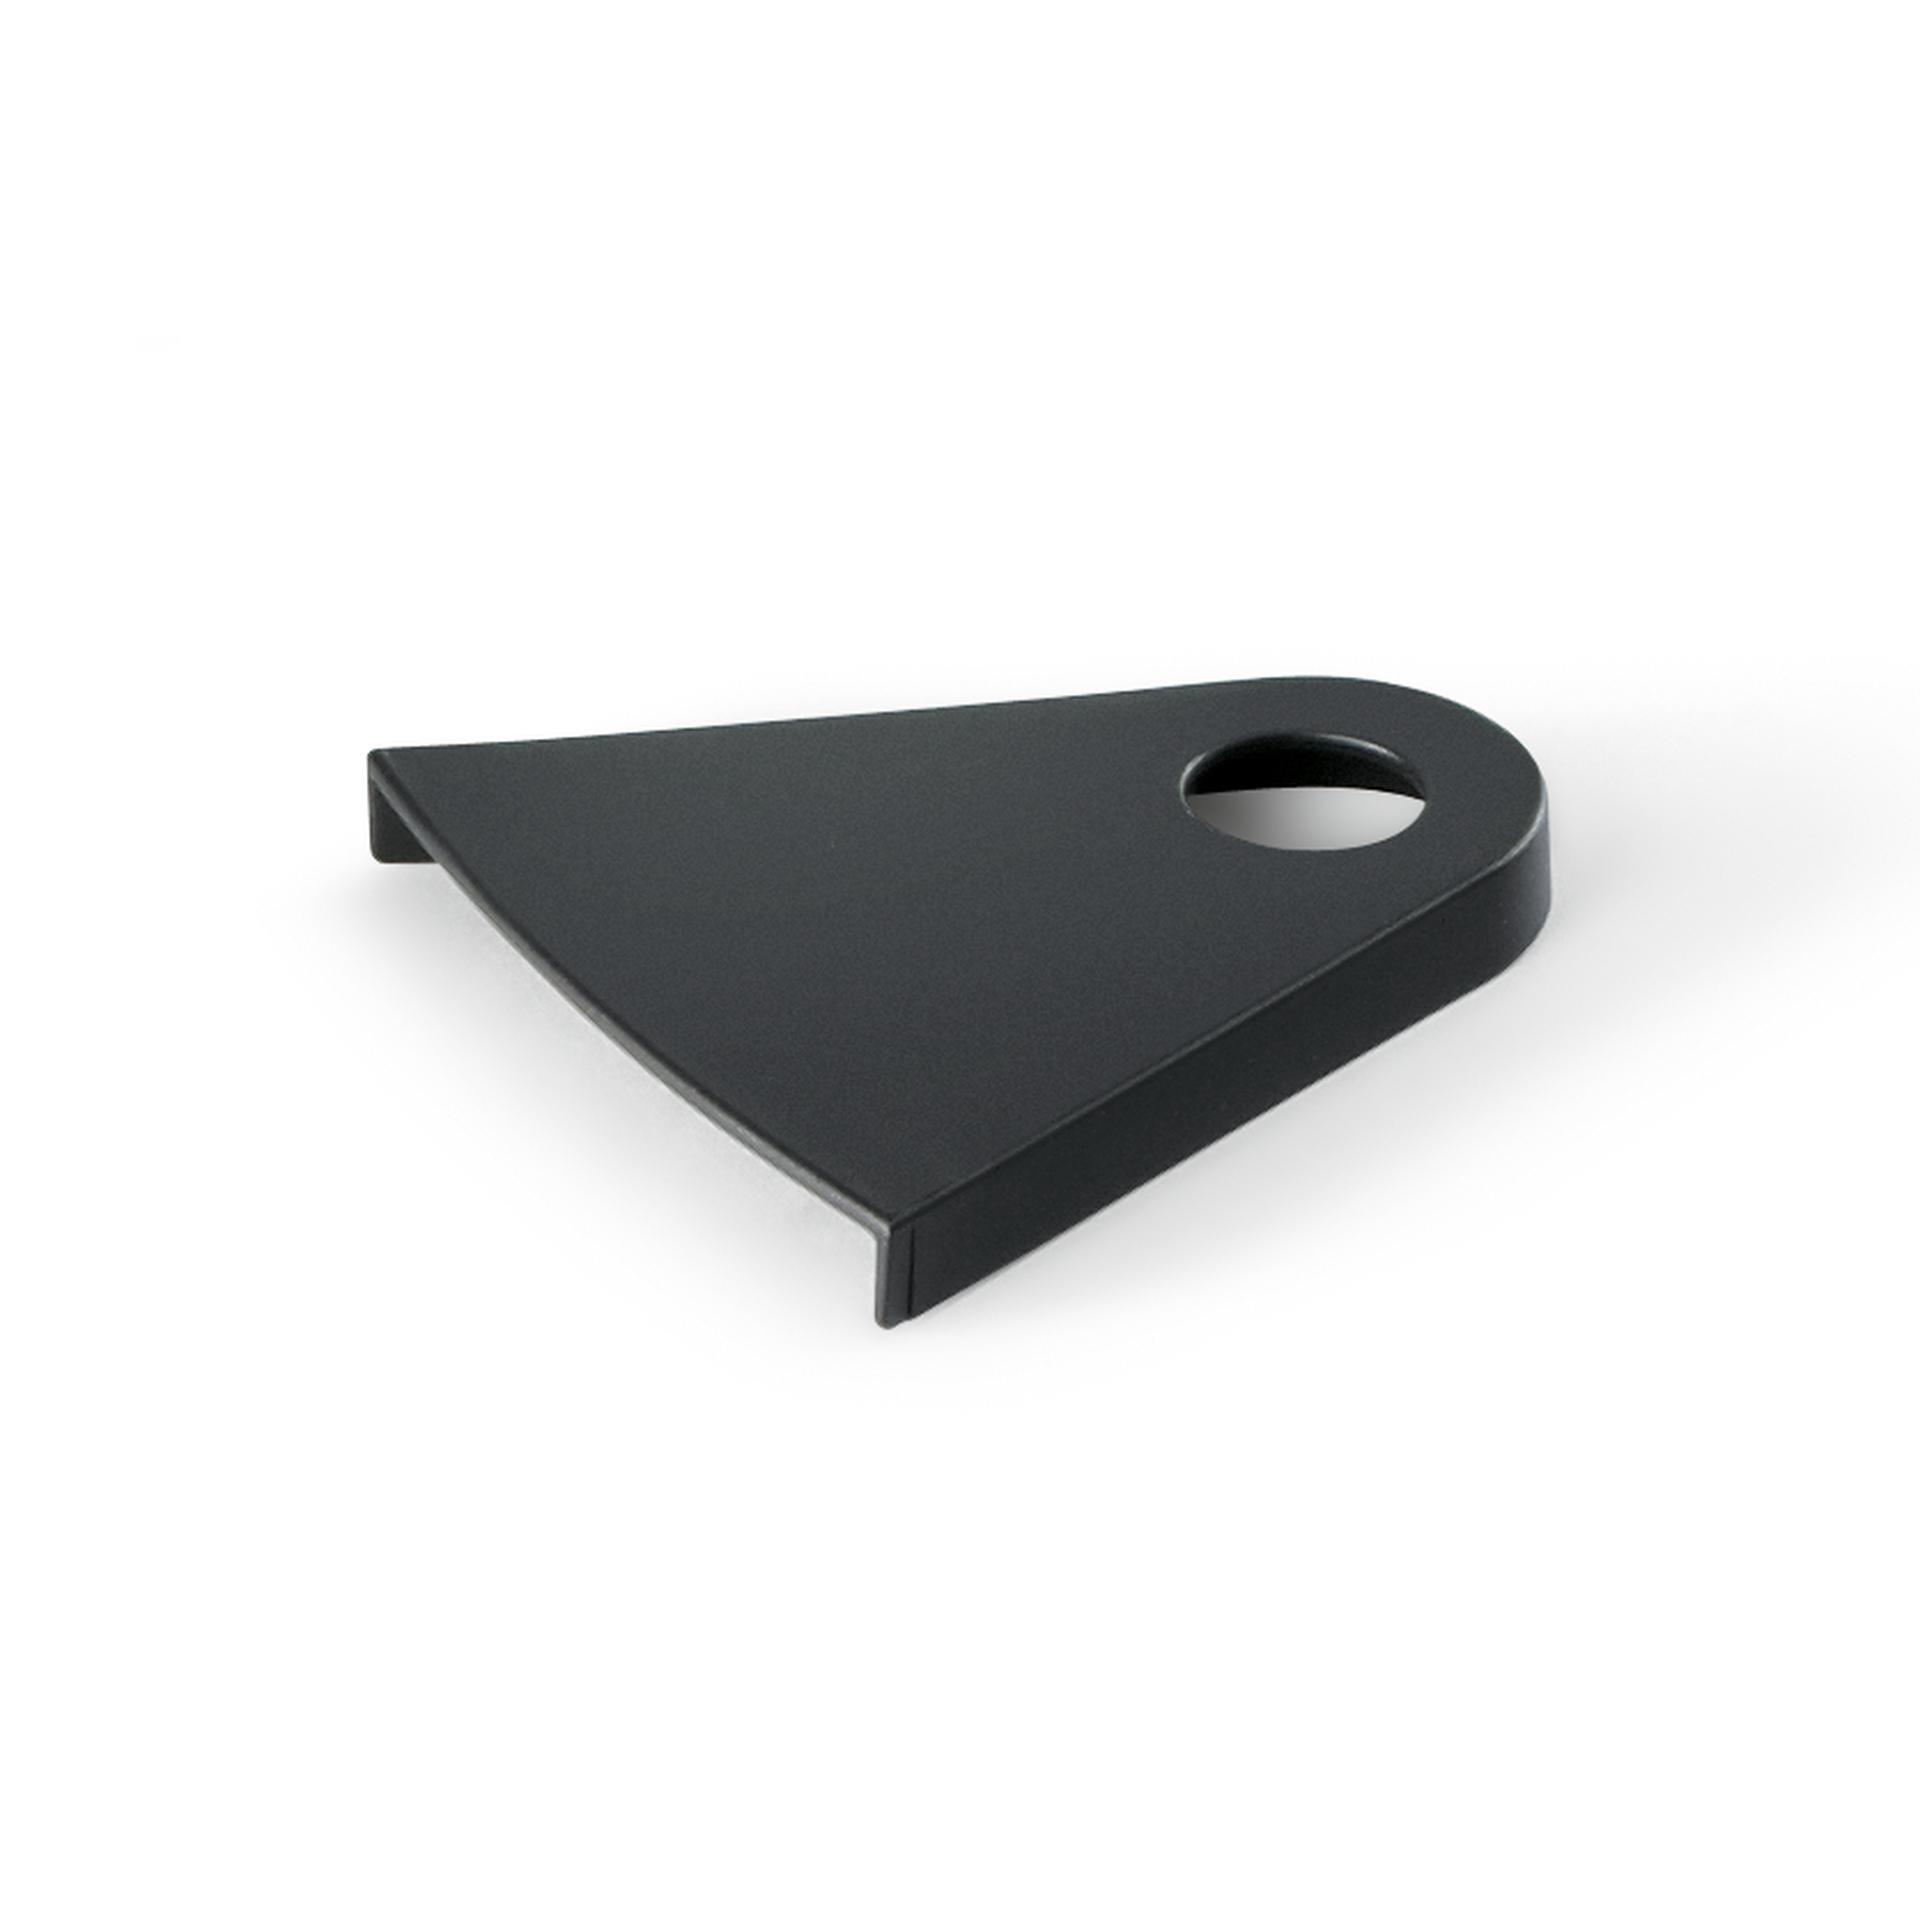 Füllschachtdeckel für CLASSICO 43 | RONDO 40 | DIAMANTE 40